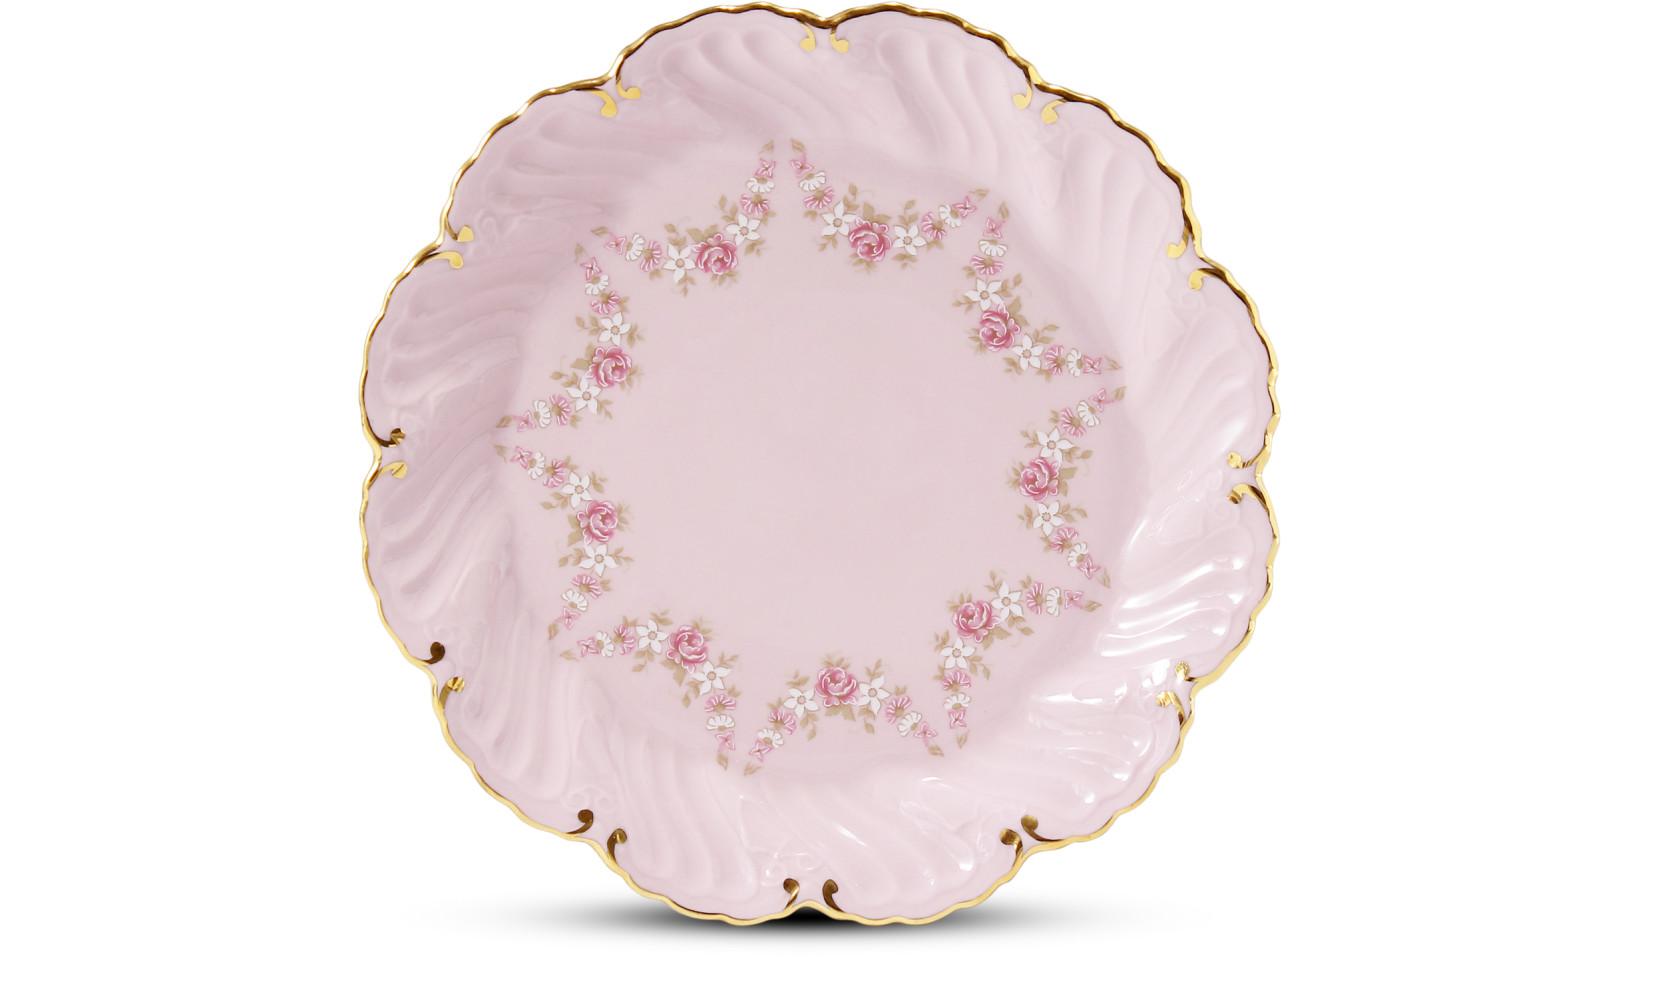 Dessertteller 17 cm Girlande aus Rosen rosa Porzellan